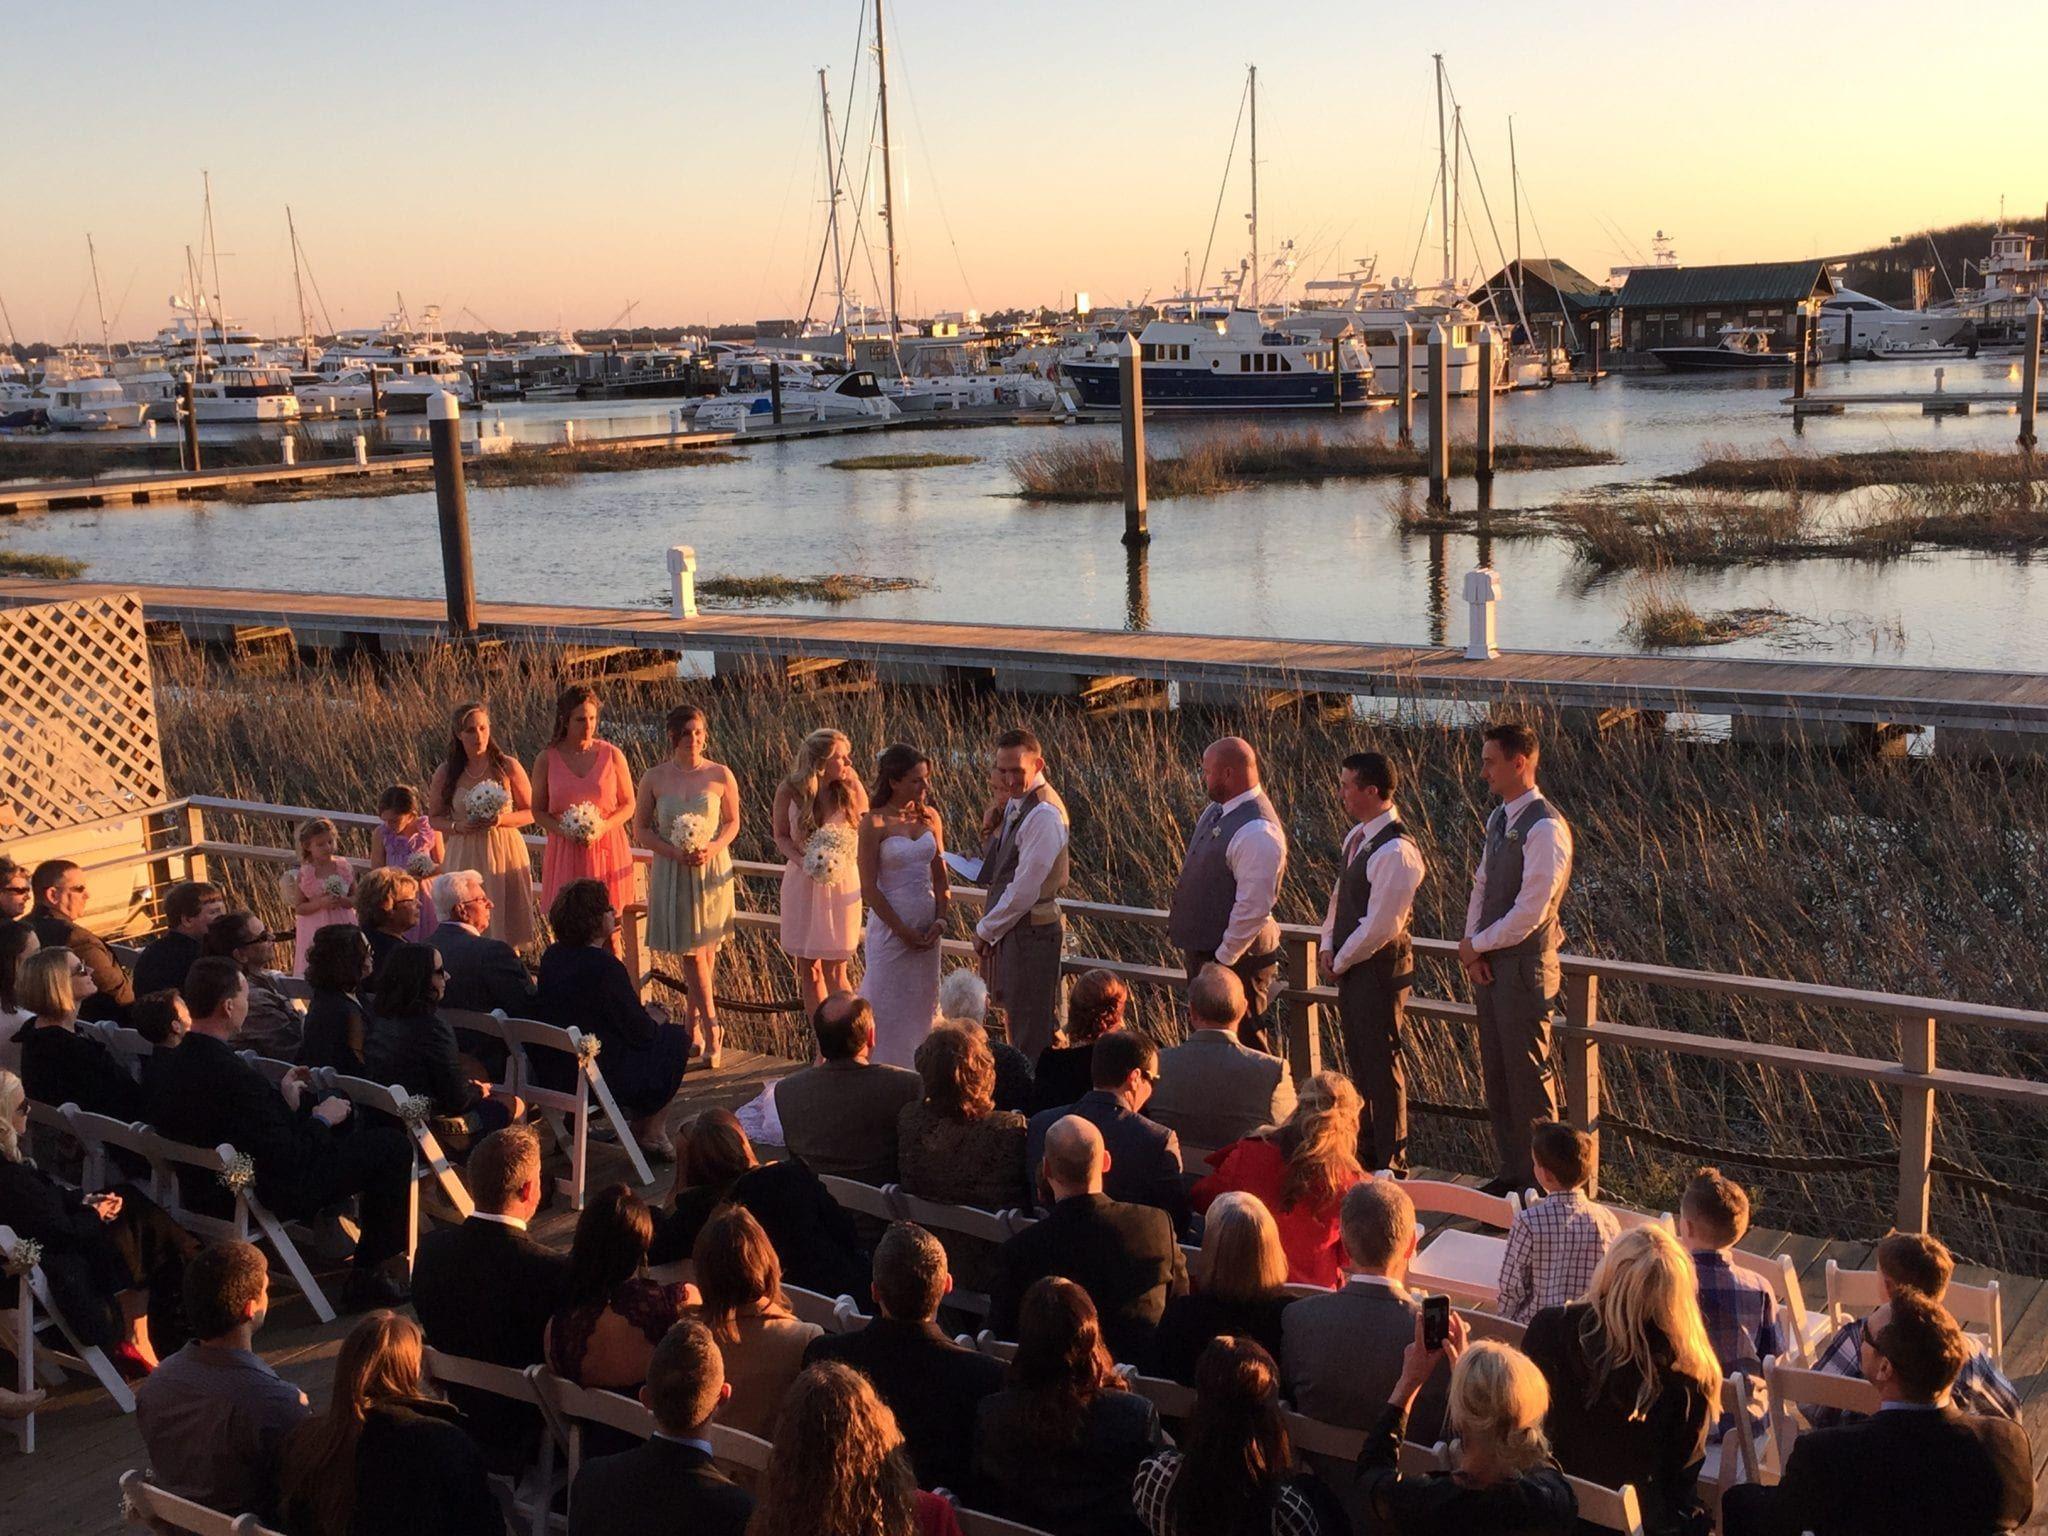 David Fox Bergey Foutz Wedding Ceremony And Reception At The Charleston Yacht Club SC